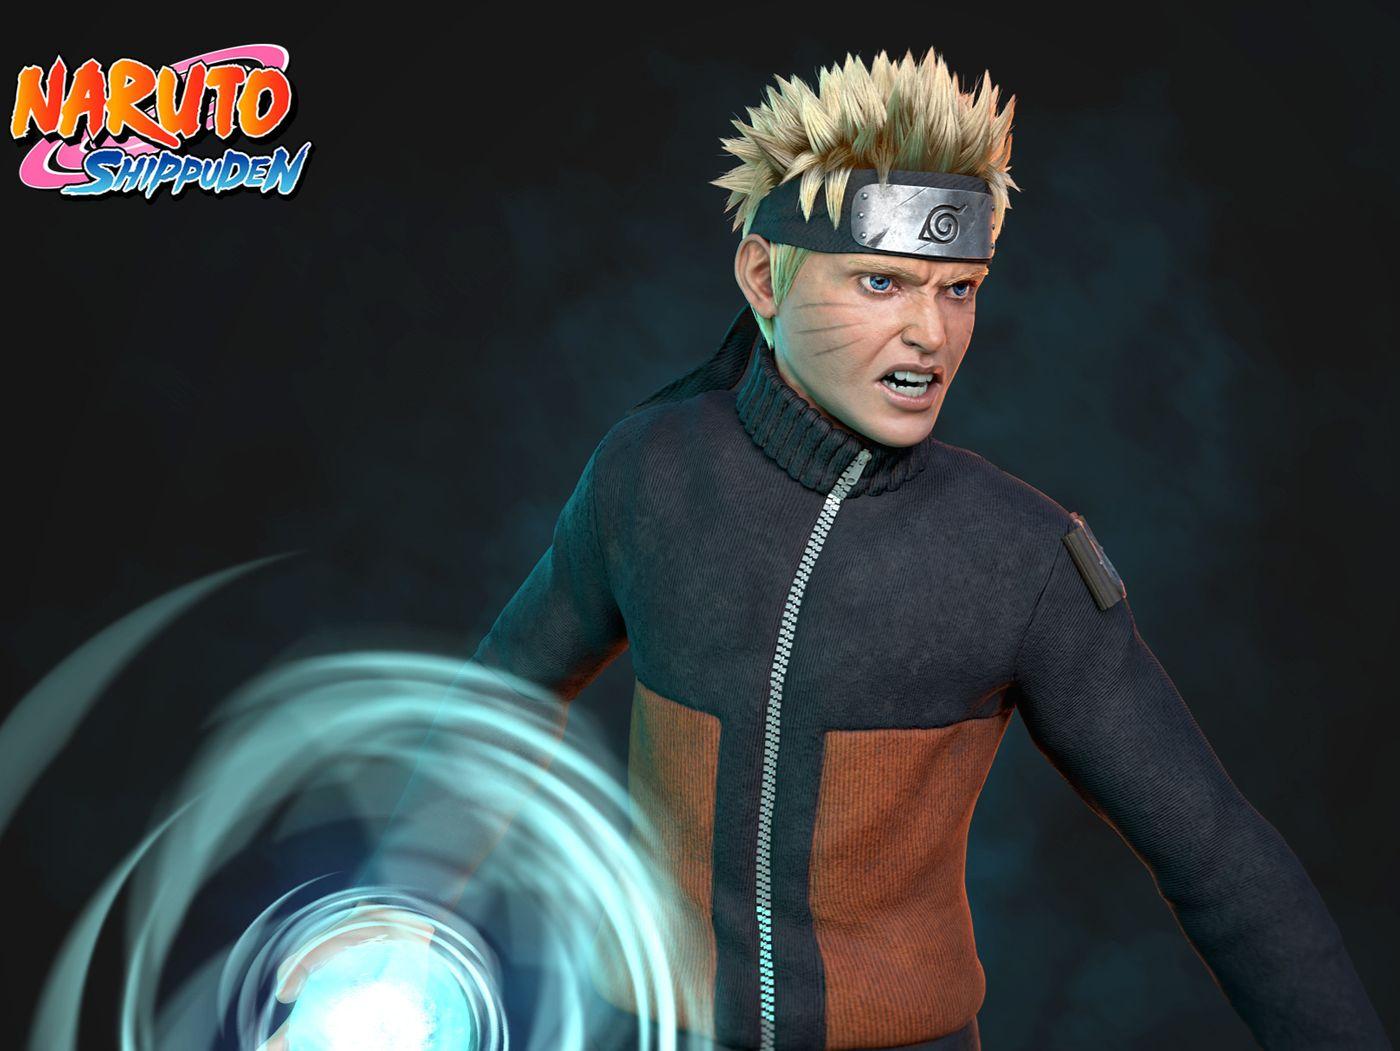 Naruto Uzumaki - Fan Art